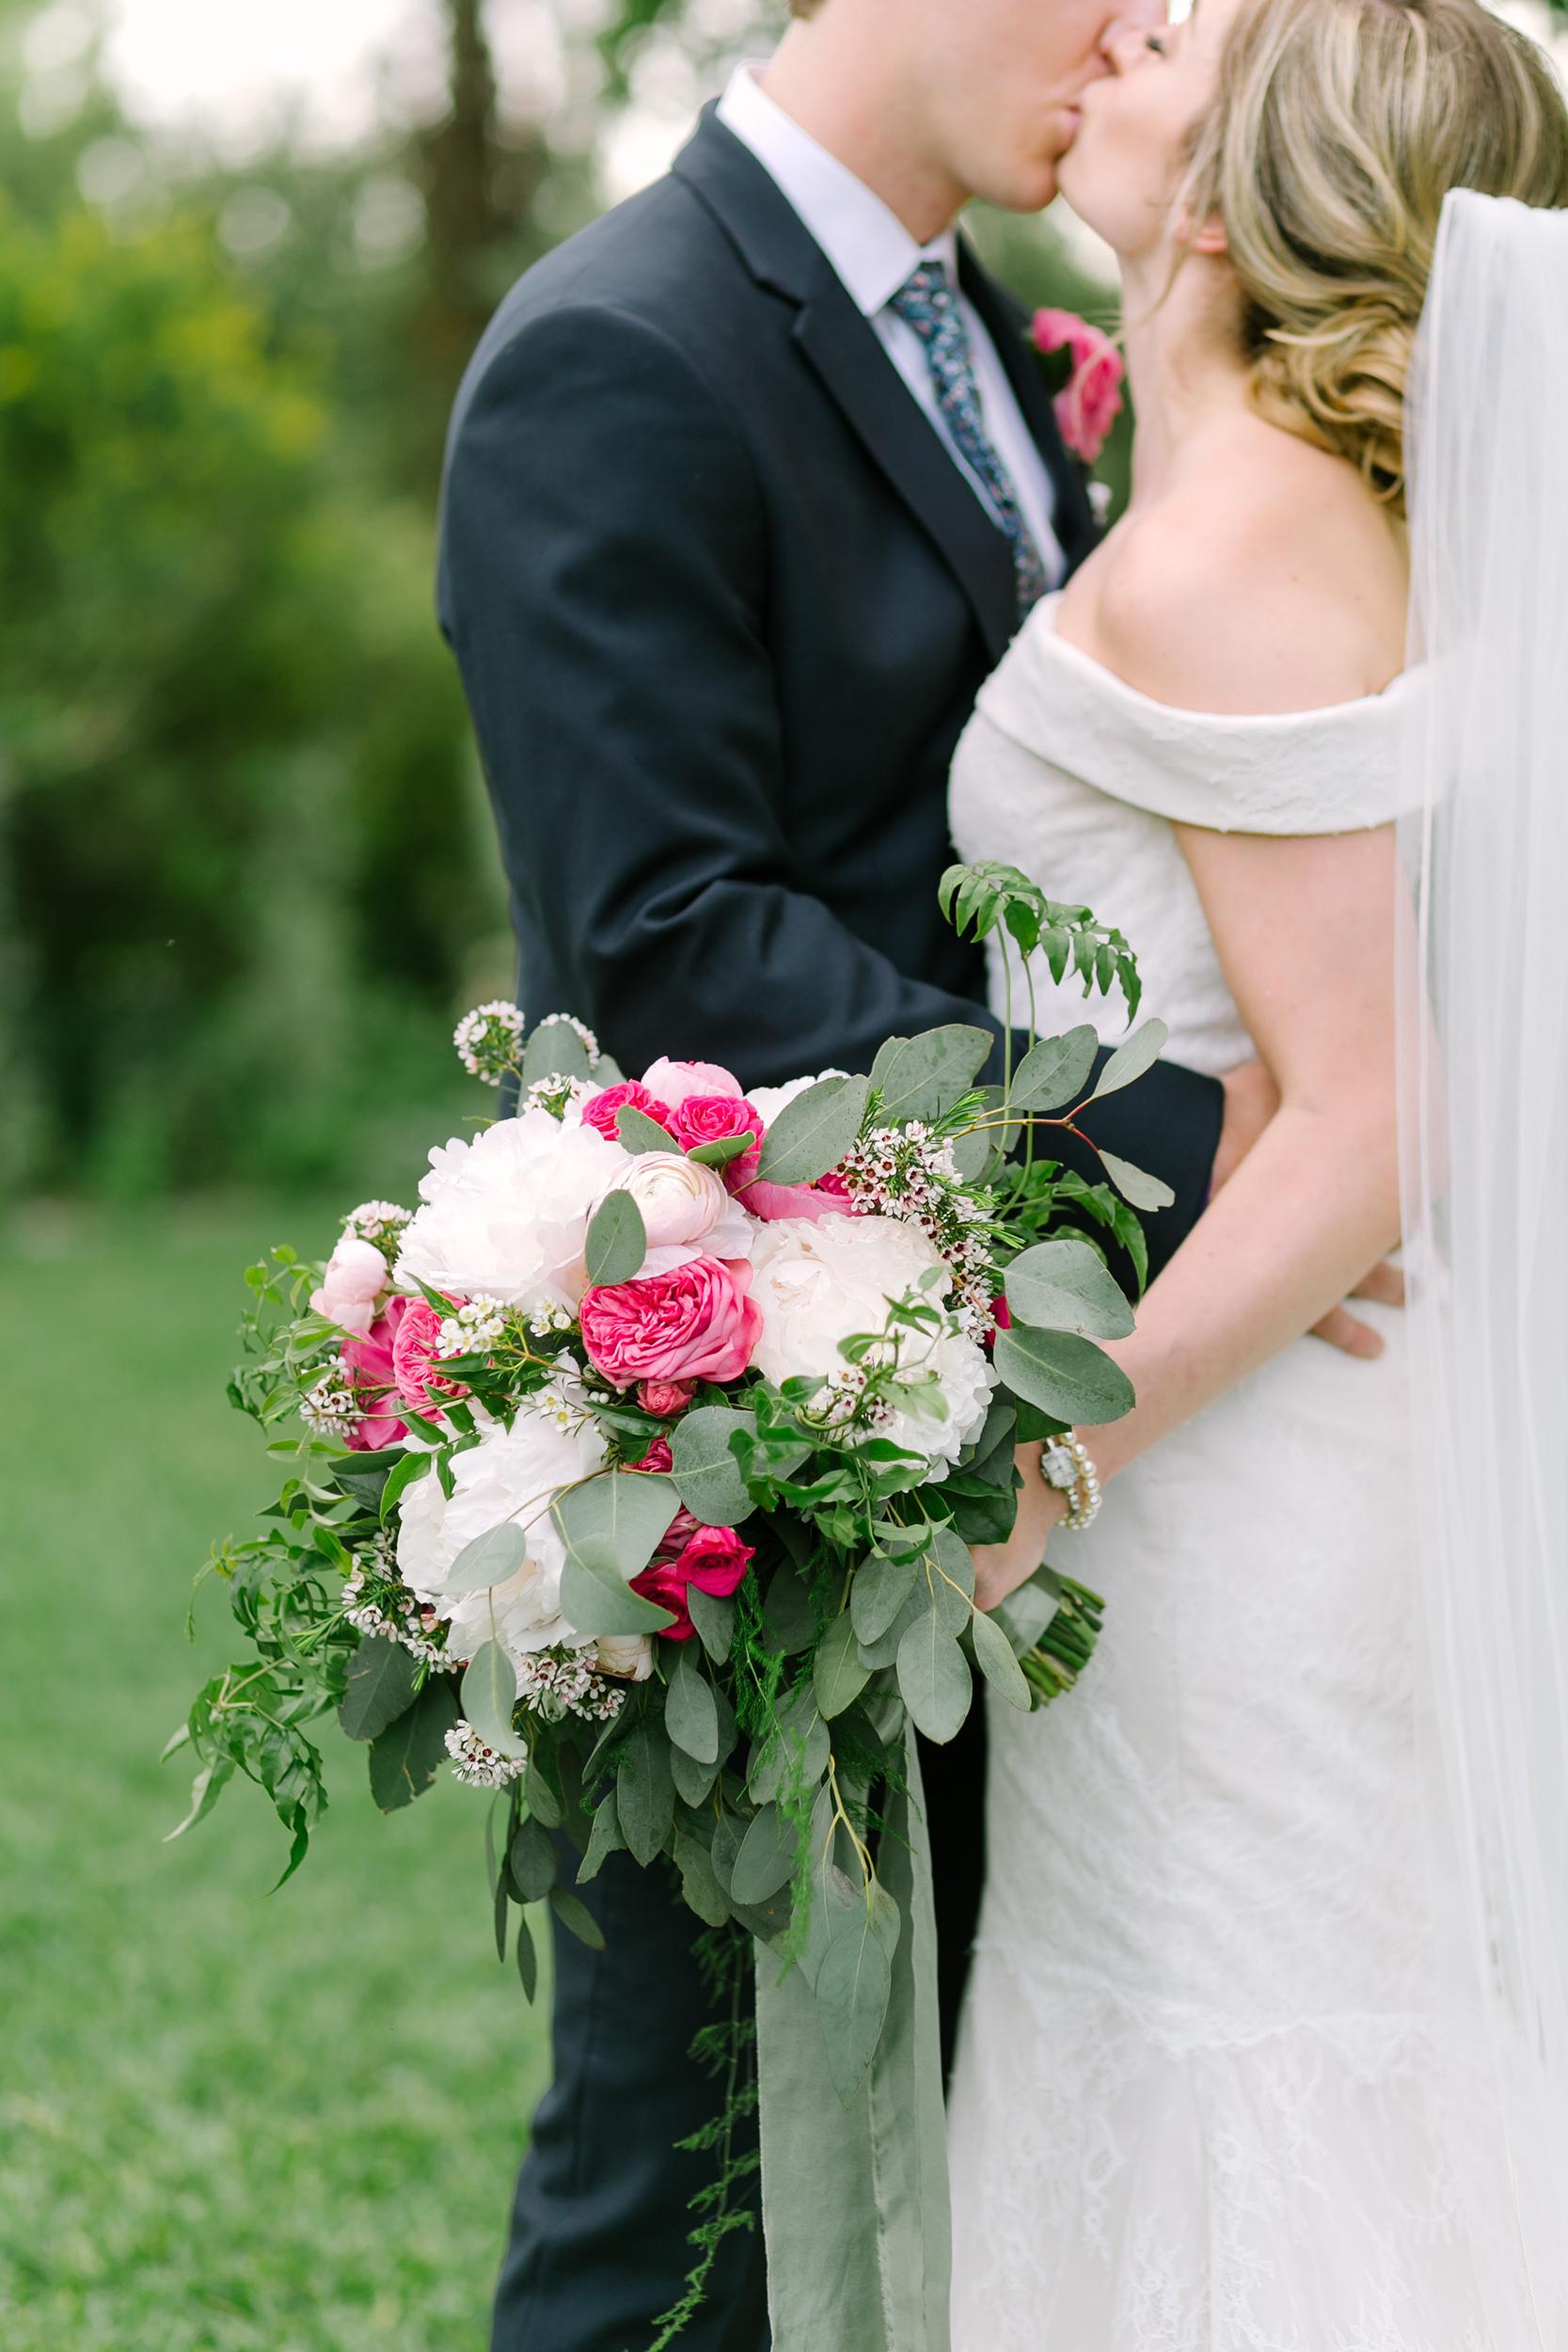 Austin_Wedding_Photographer_Kimberly_Brooke_Photographic_114.jpg